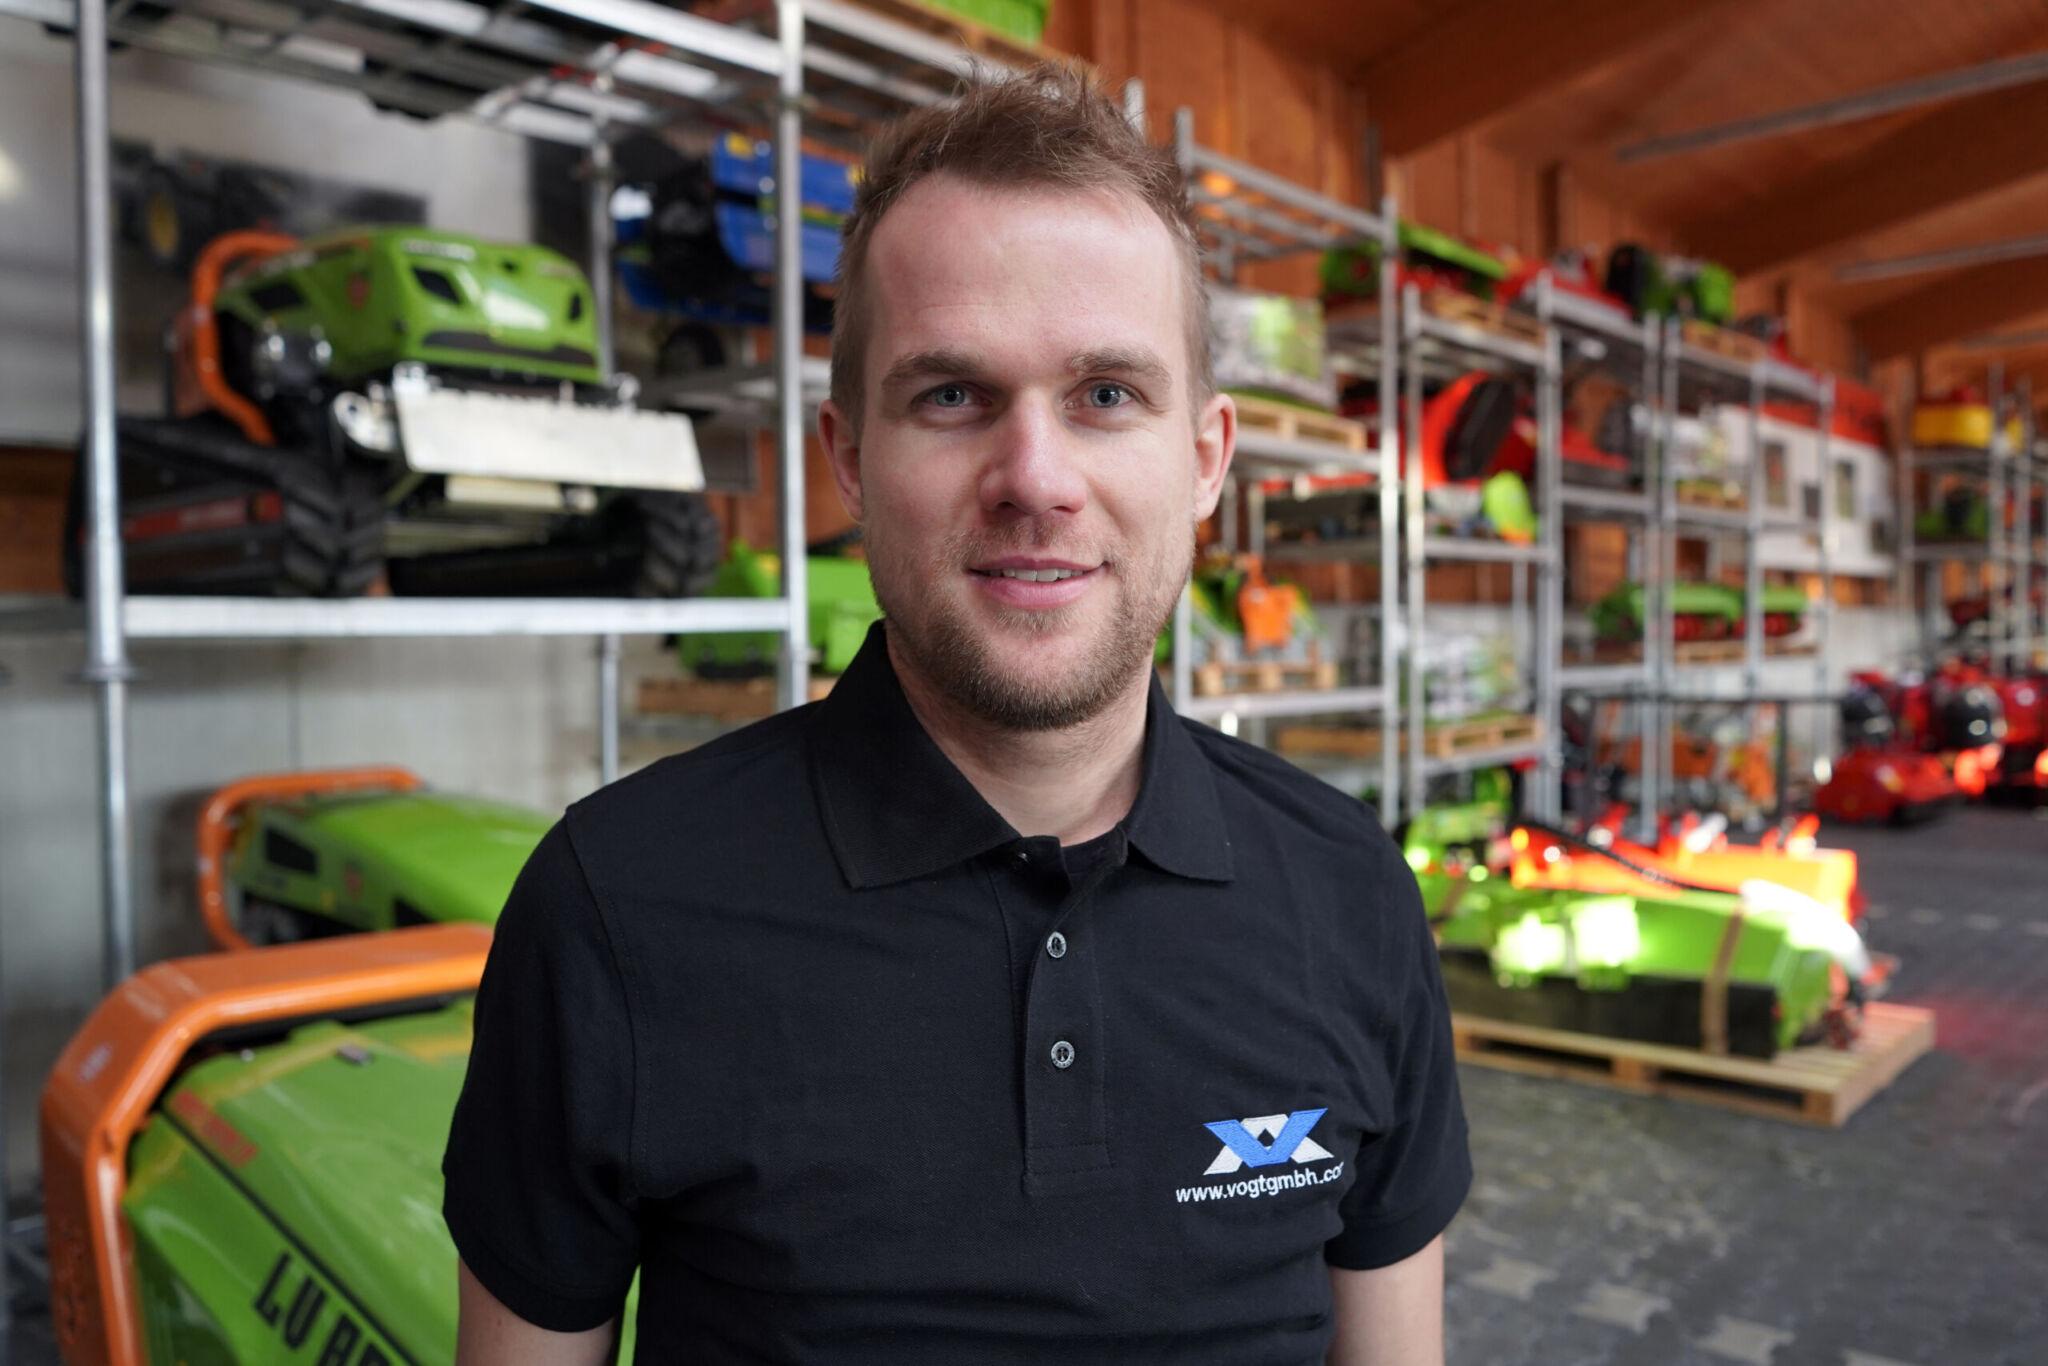 Vogt_Paul_Rebmann|copyright: Vogt GmbH